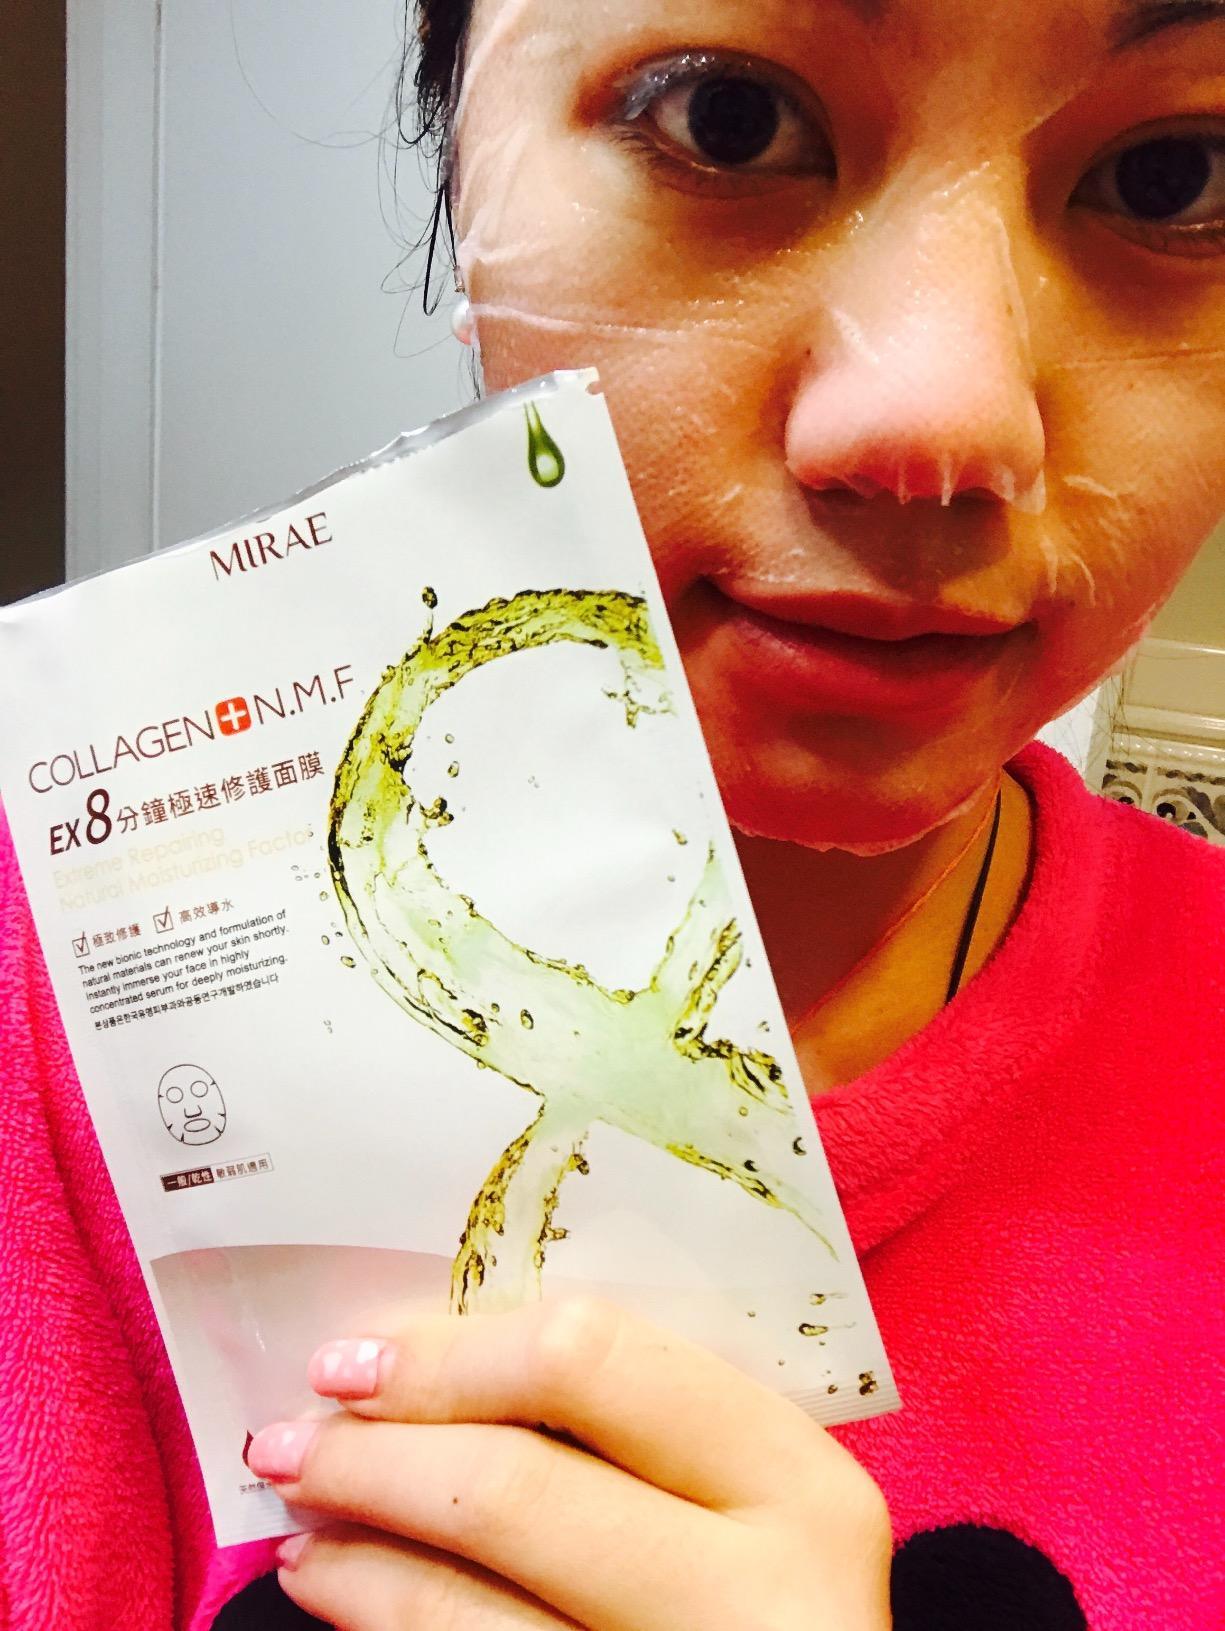 3134e7a7c3d8 MIRAE Beauty 8 Minutes Brightening Facial Sheet Mask ...